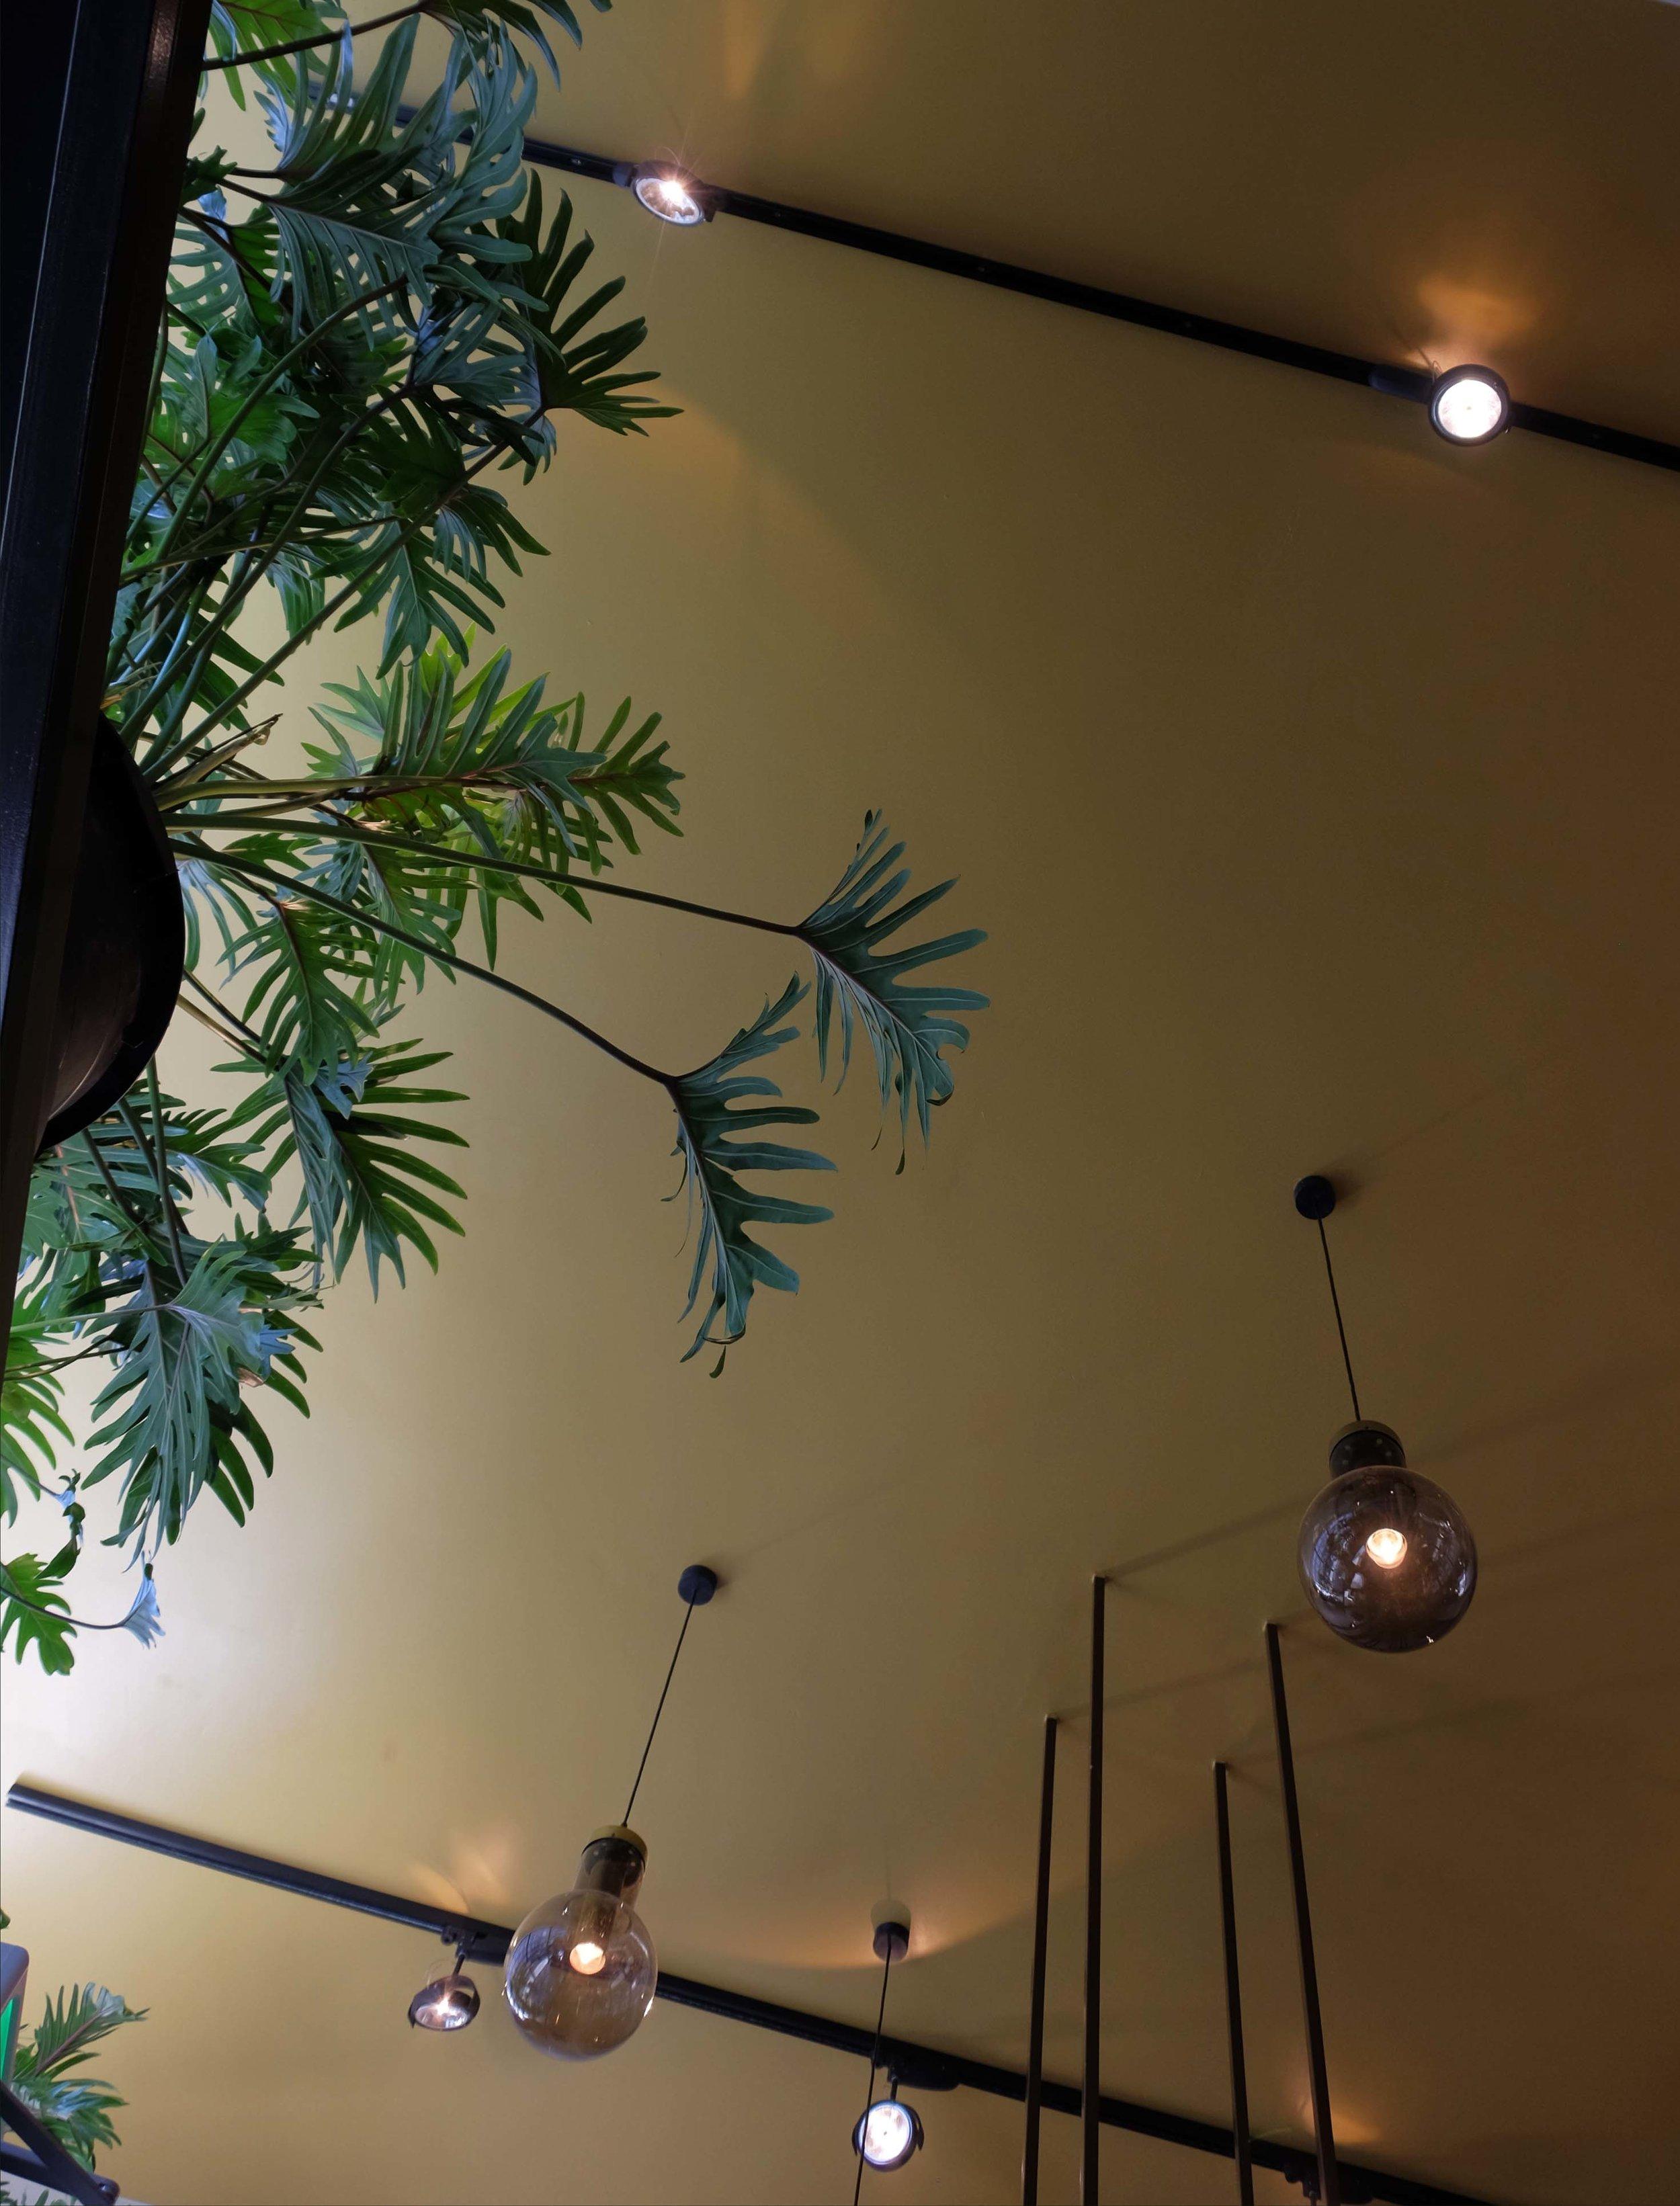 Restaurant Nooch Rotterdam westewagenstraat 56 lex de gooijer interiors 012.jpg